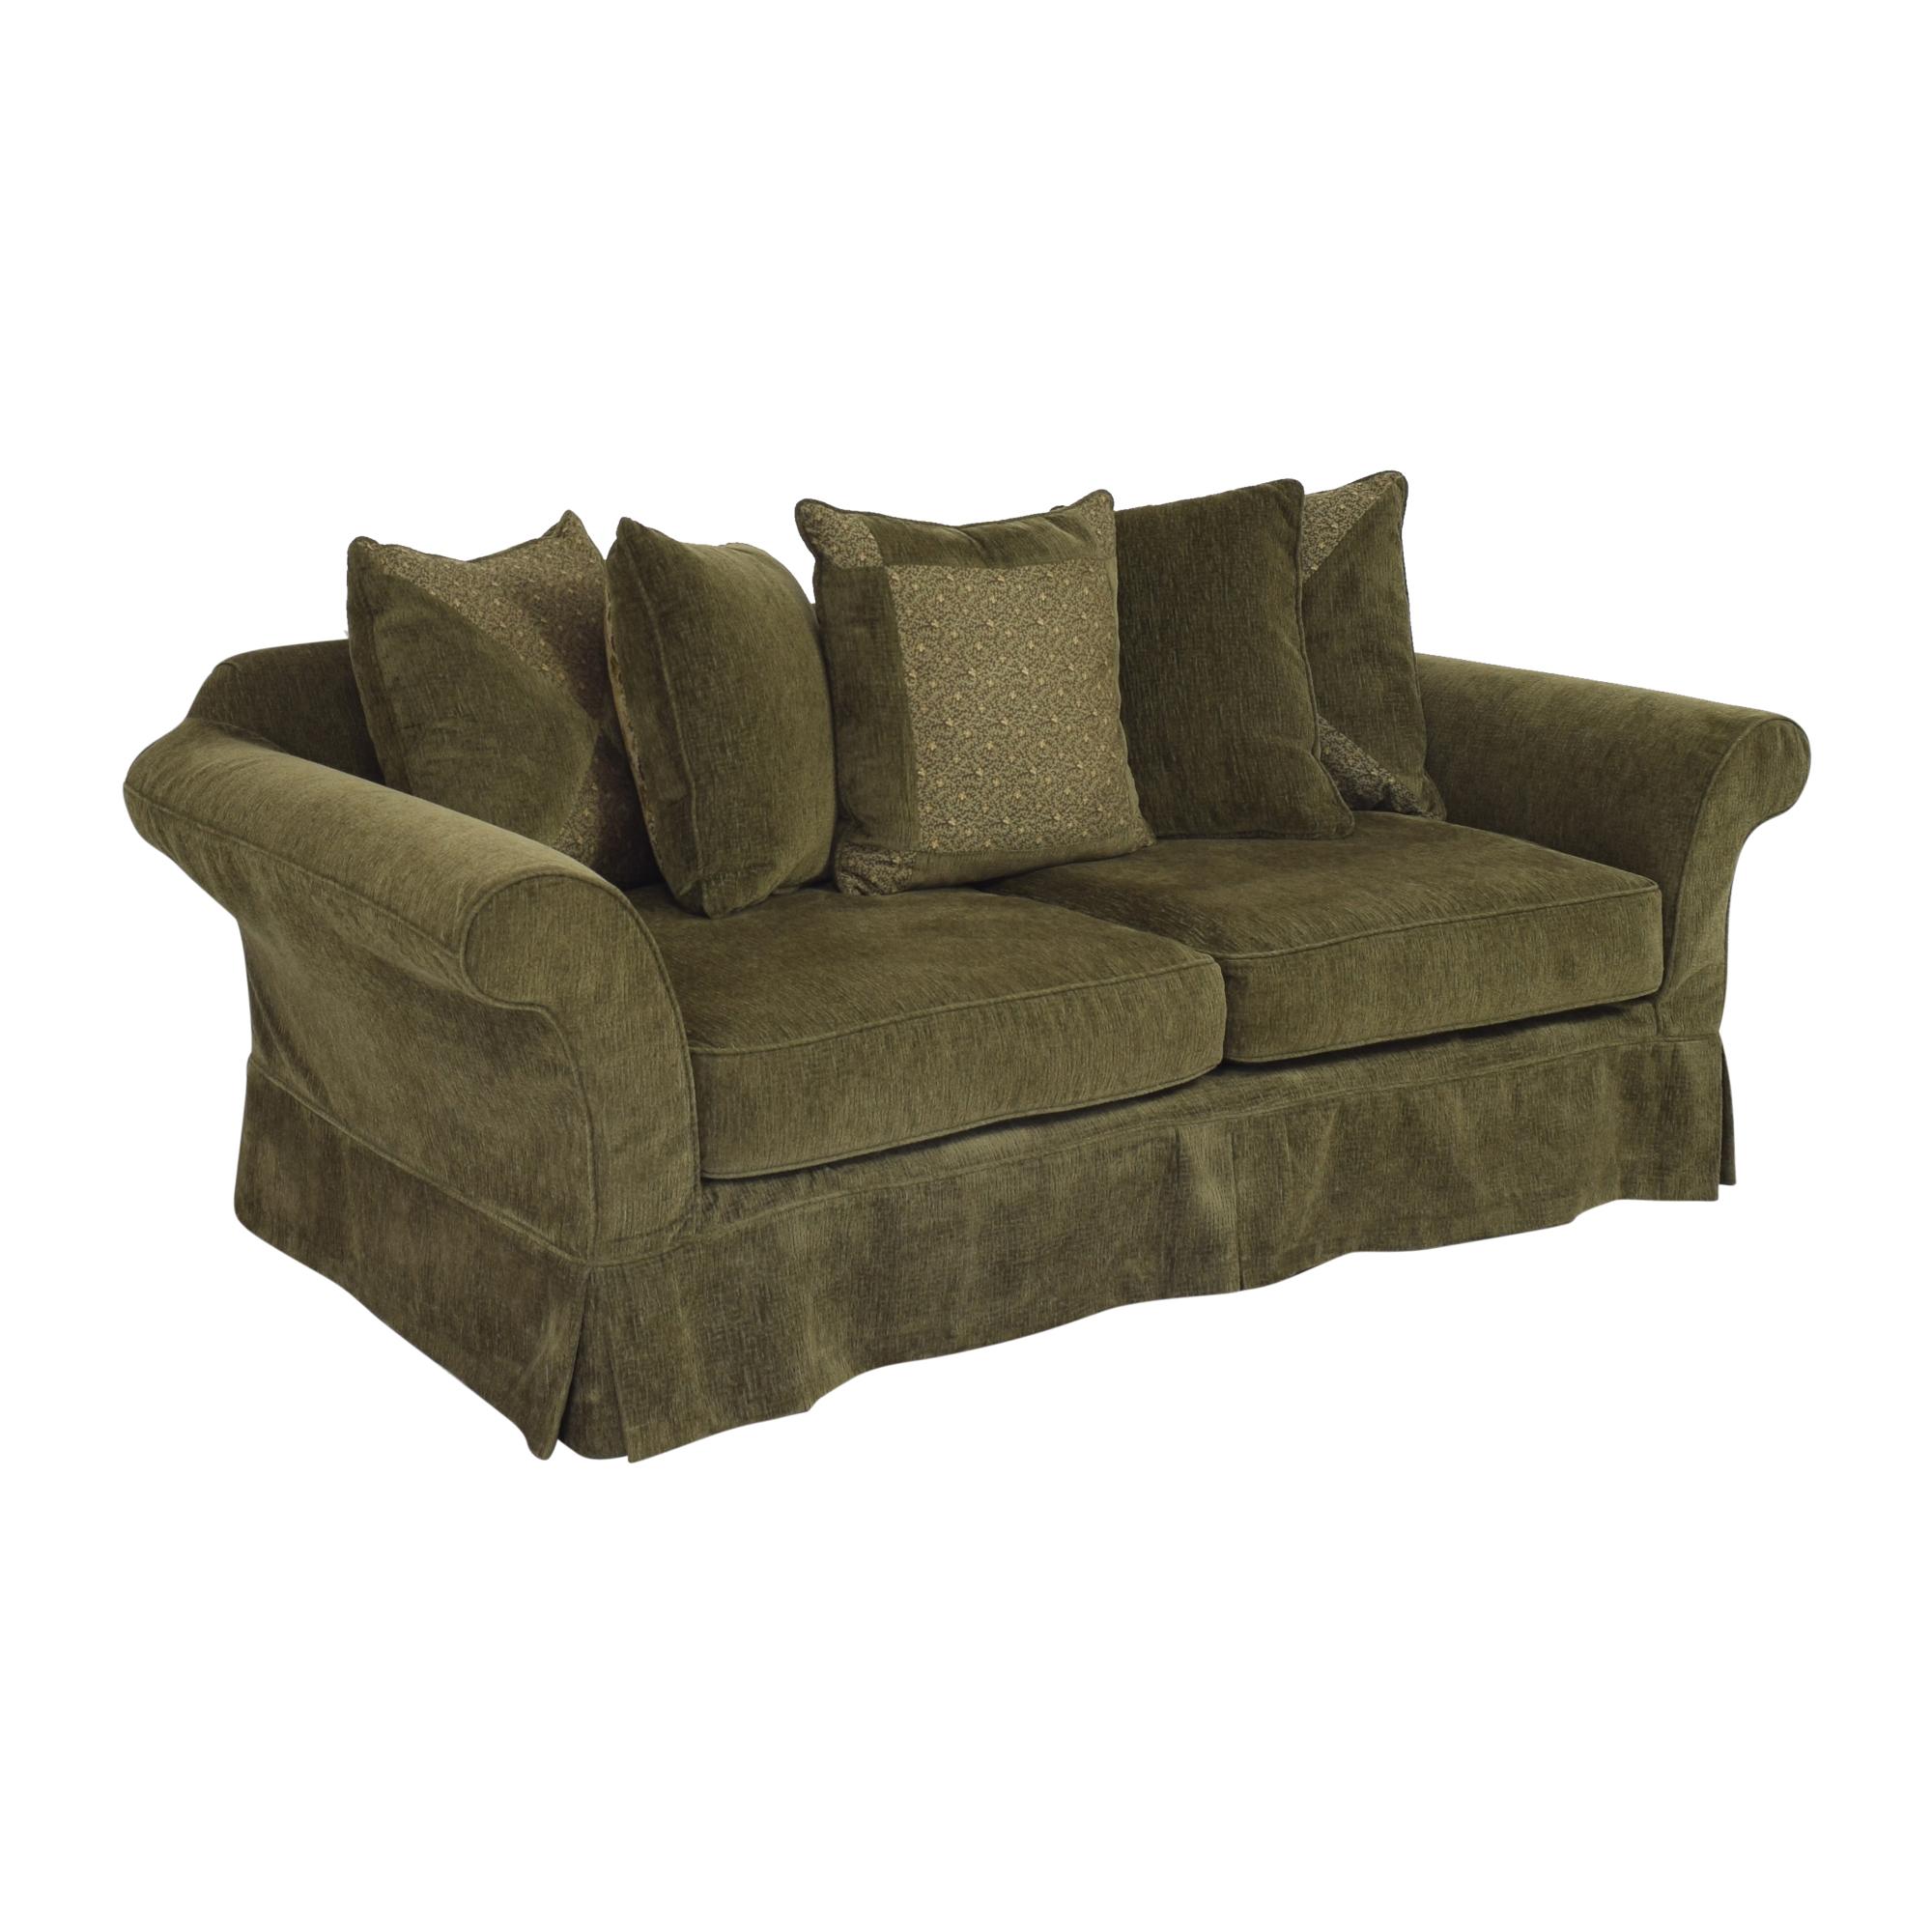 Flared Arm Skirted Sofa / Sofas